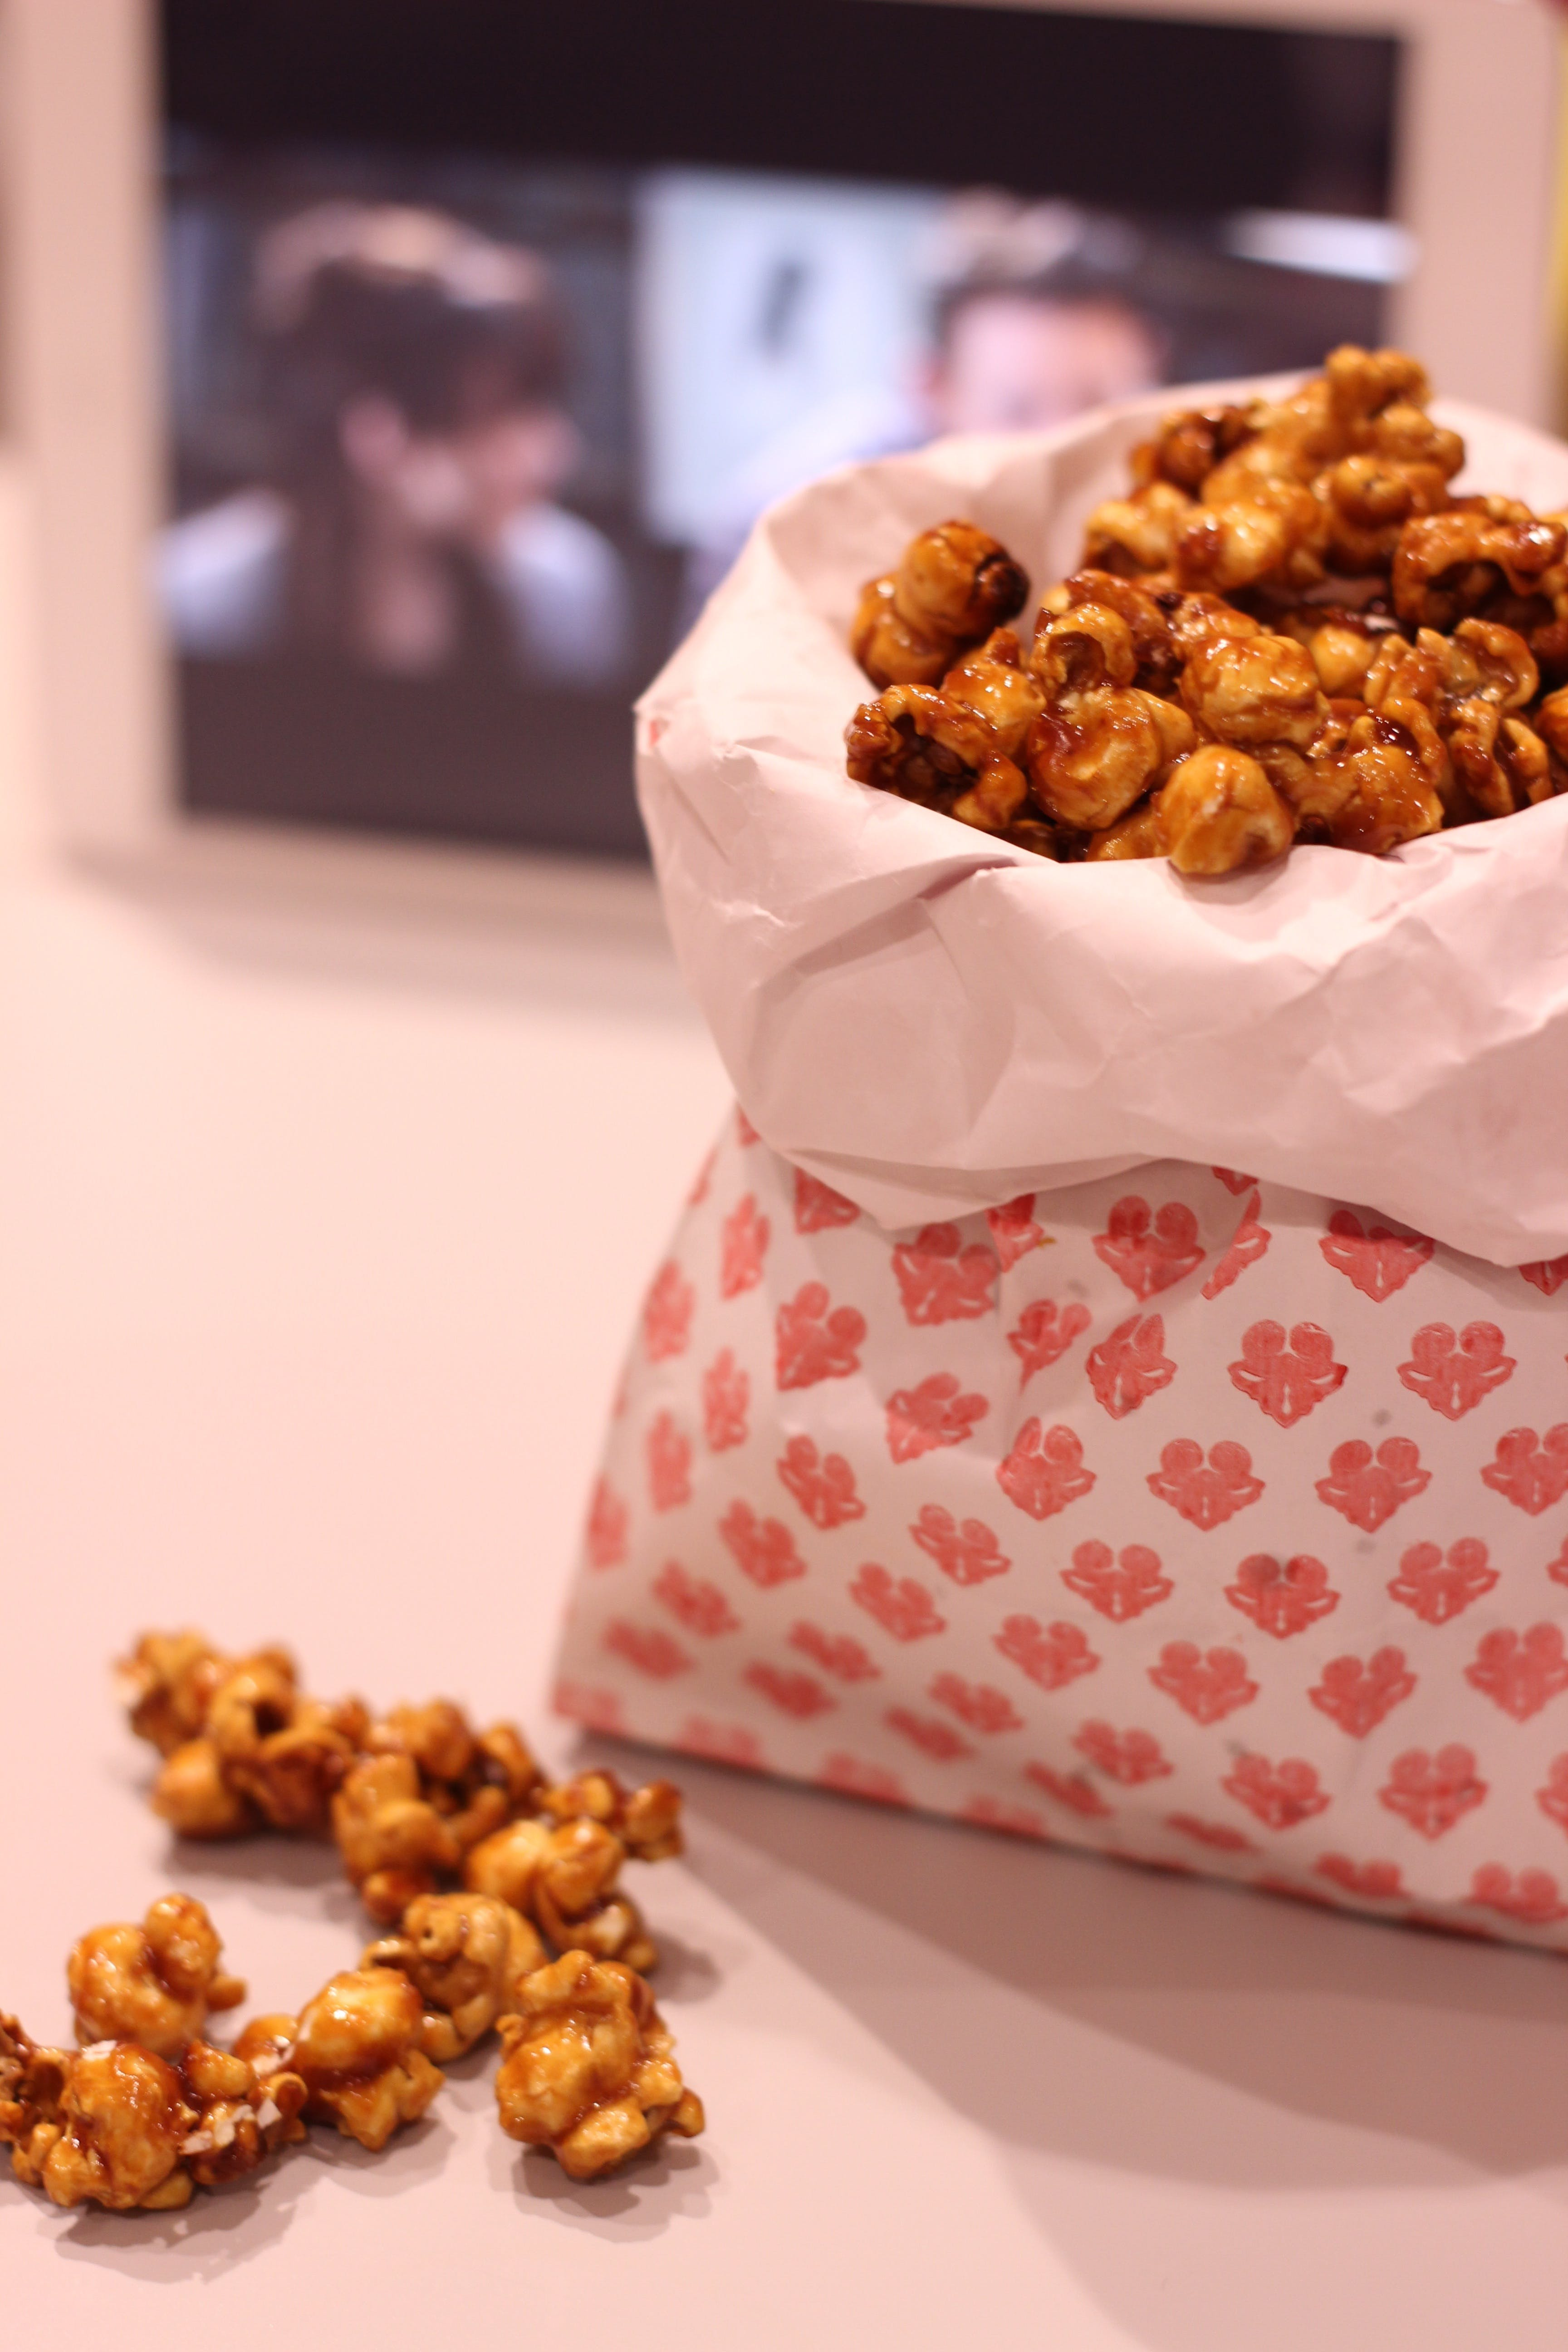 Kostenloses Stock Foto zu caramel popcorn, essen, karamellisierten, lecker